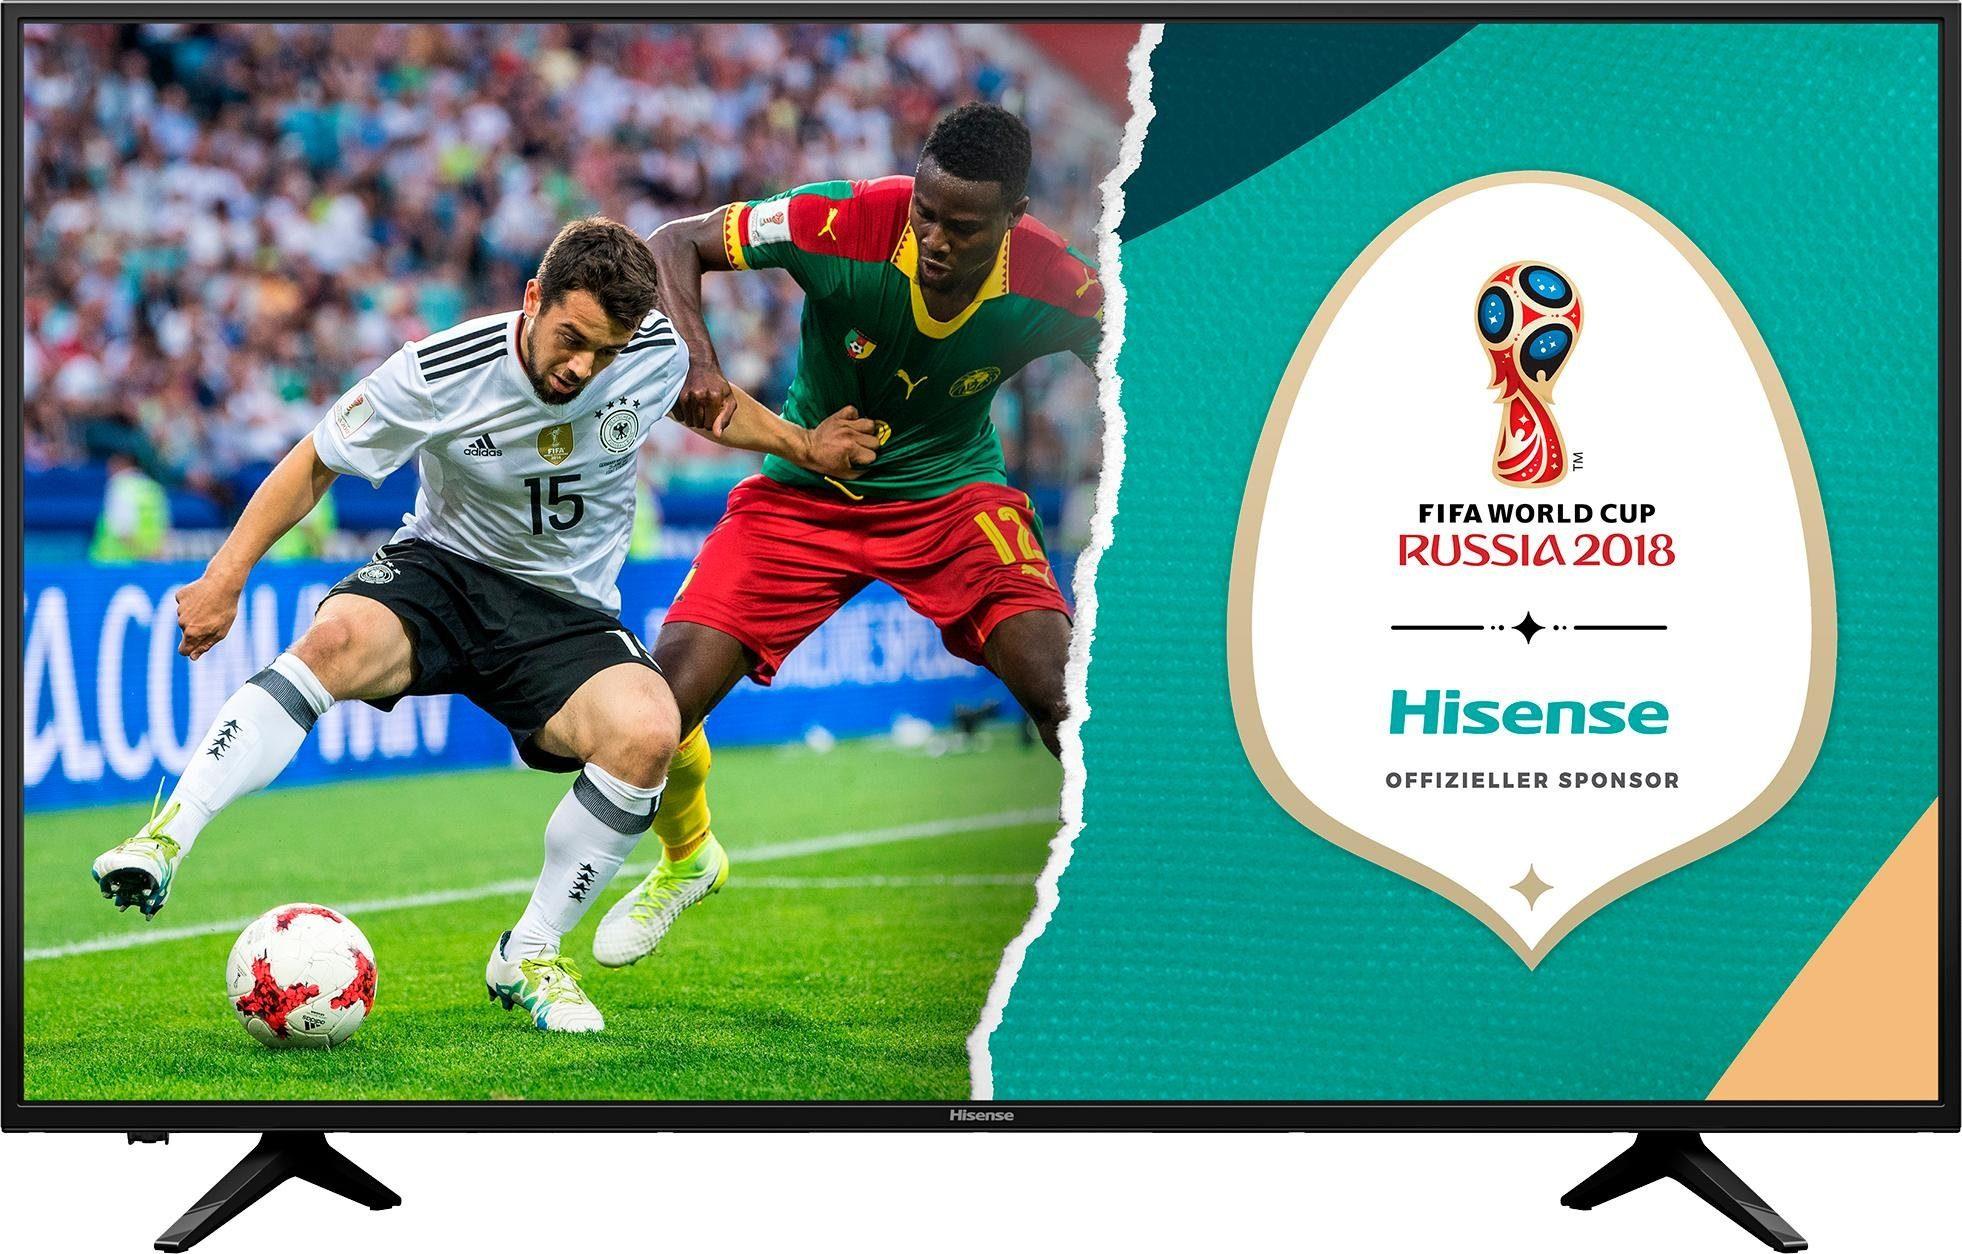 Hisense H50AE6000 LED-Fernseher (50 Zoll, 4K Ultra HD, Smart-TV)